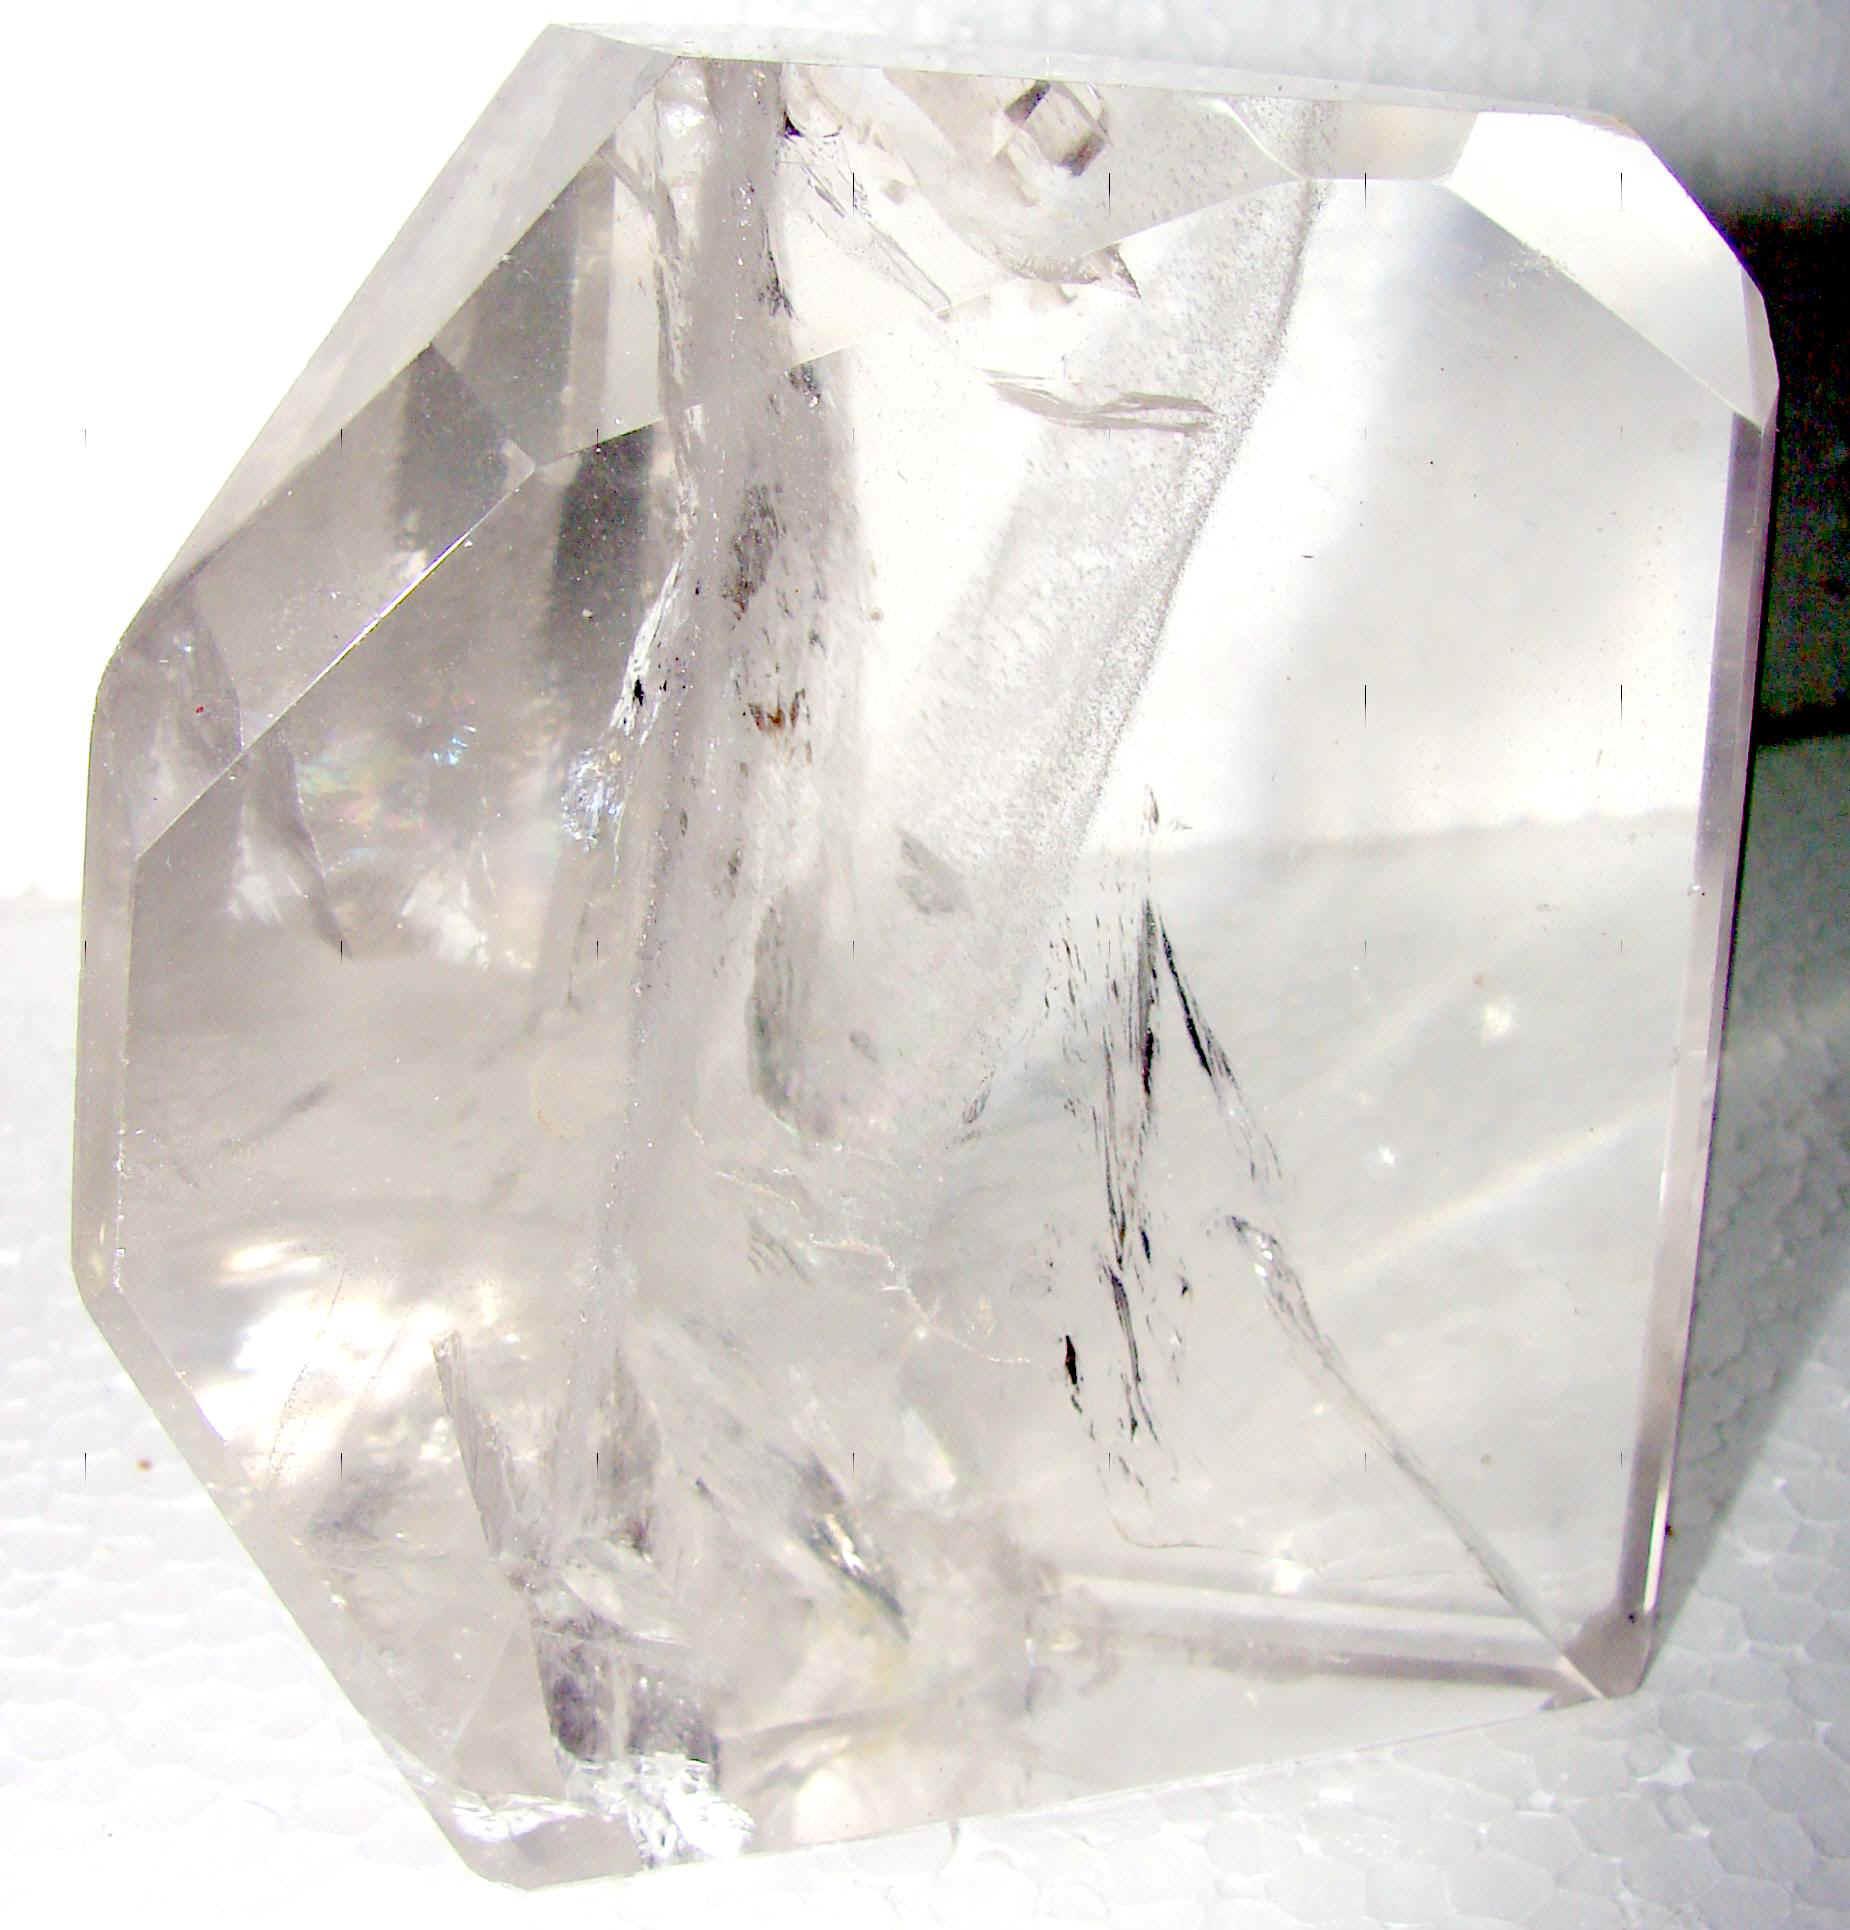 http://www.quartzcrystals.net/nuff-13.jpg (807370 bytes)